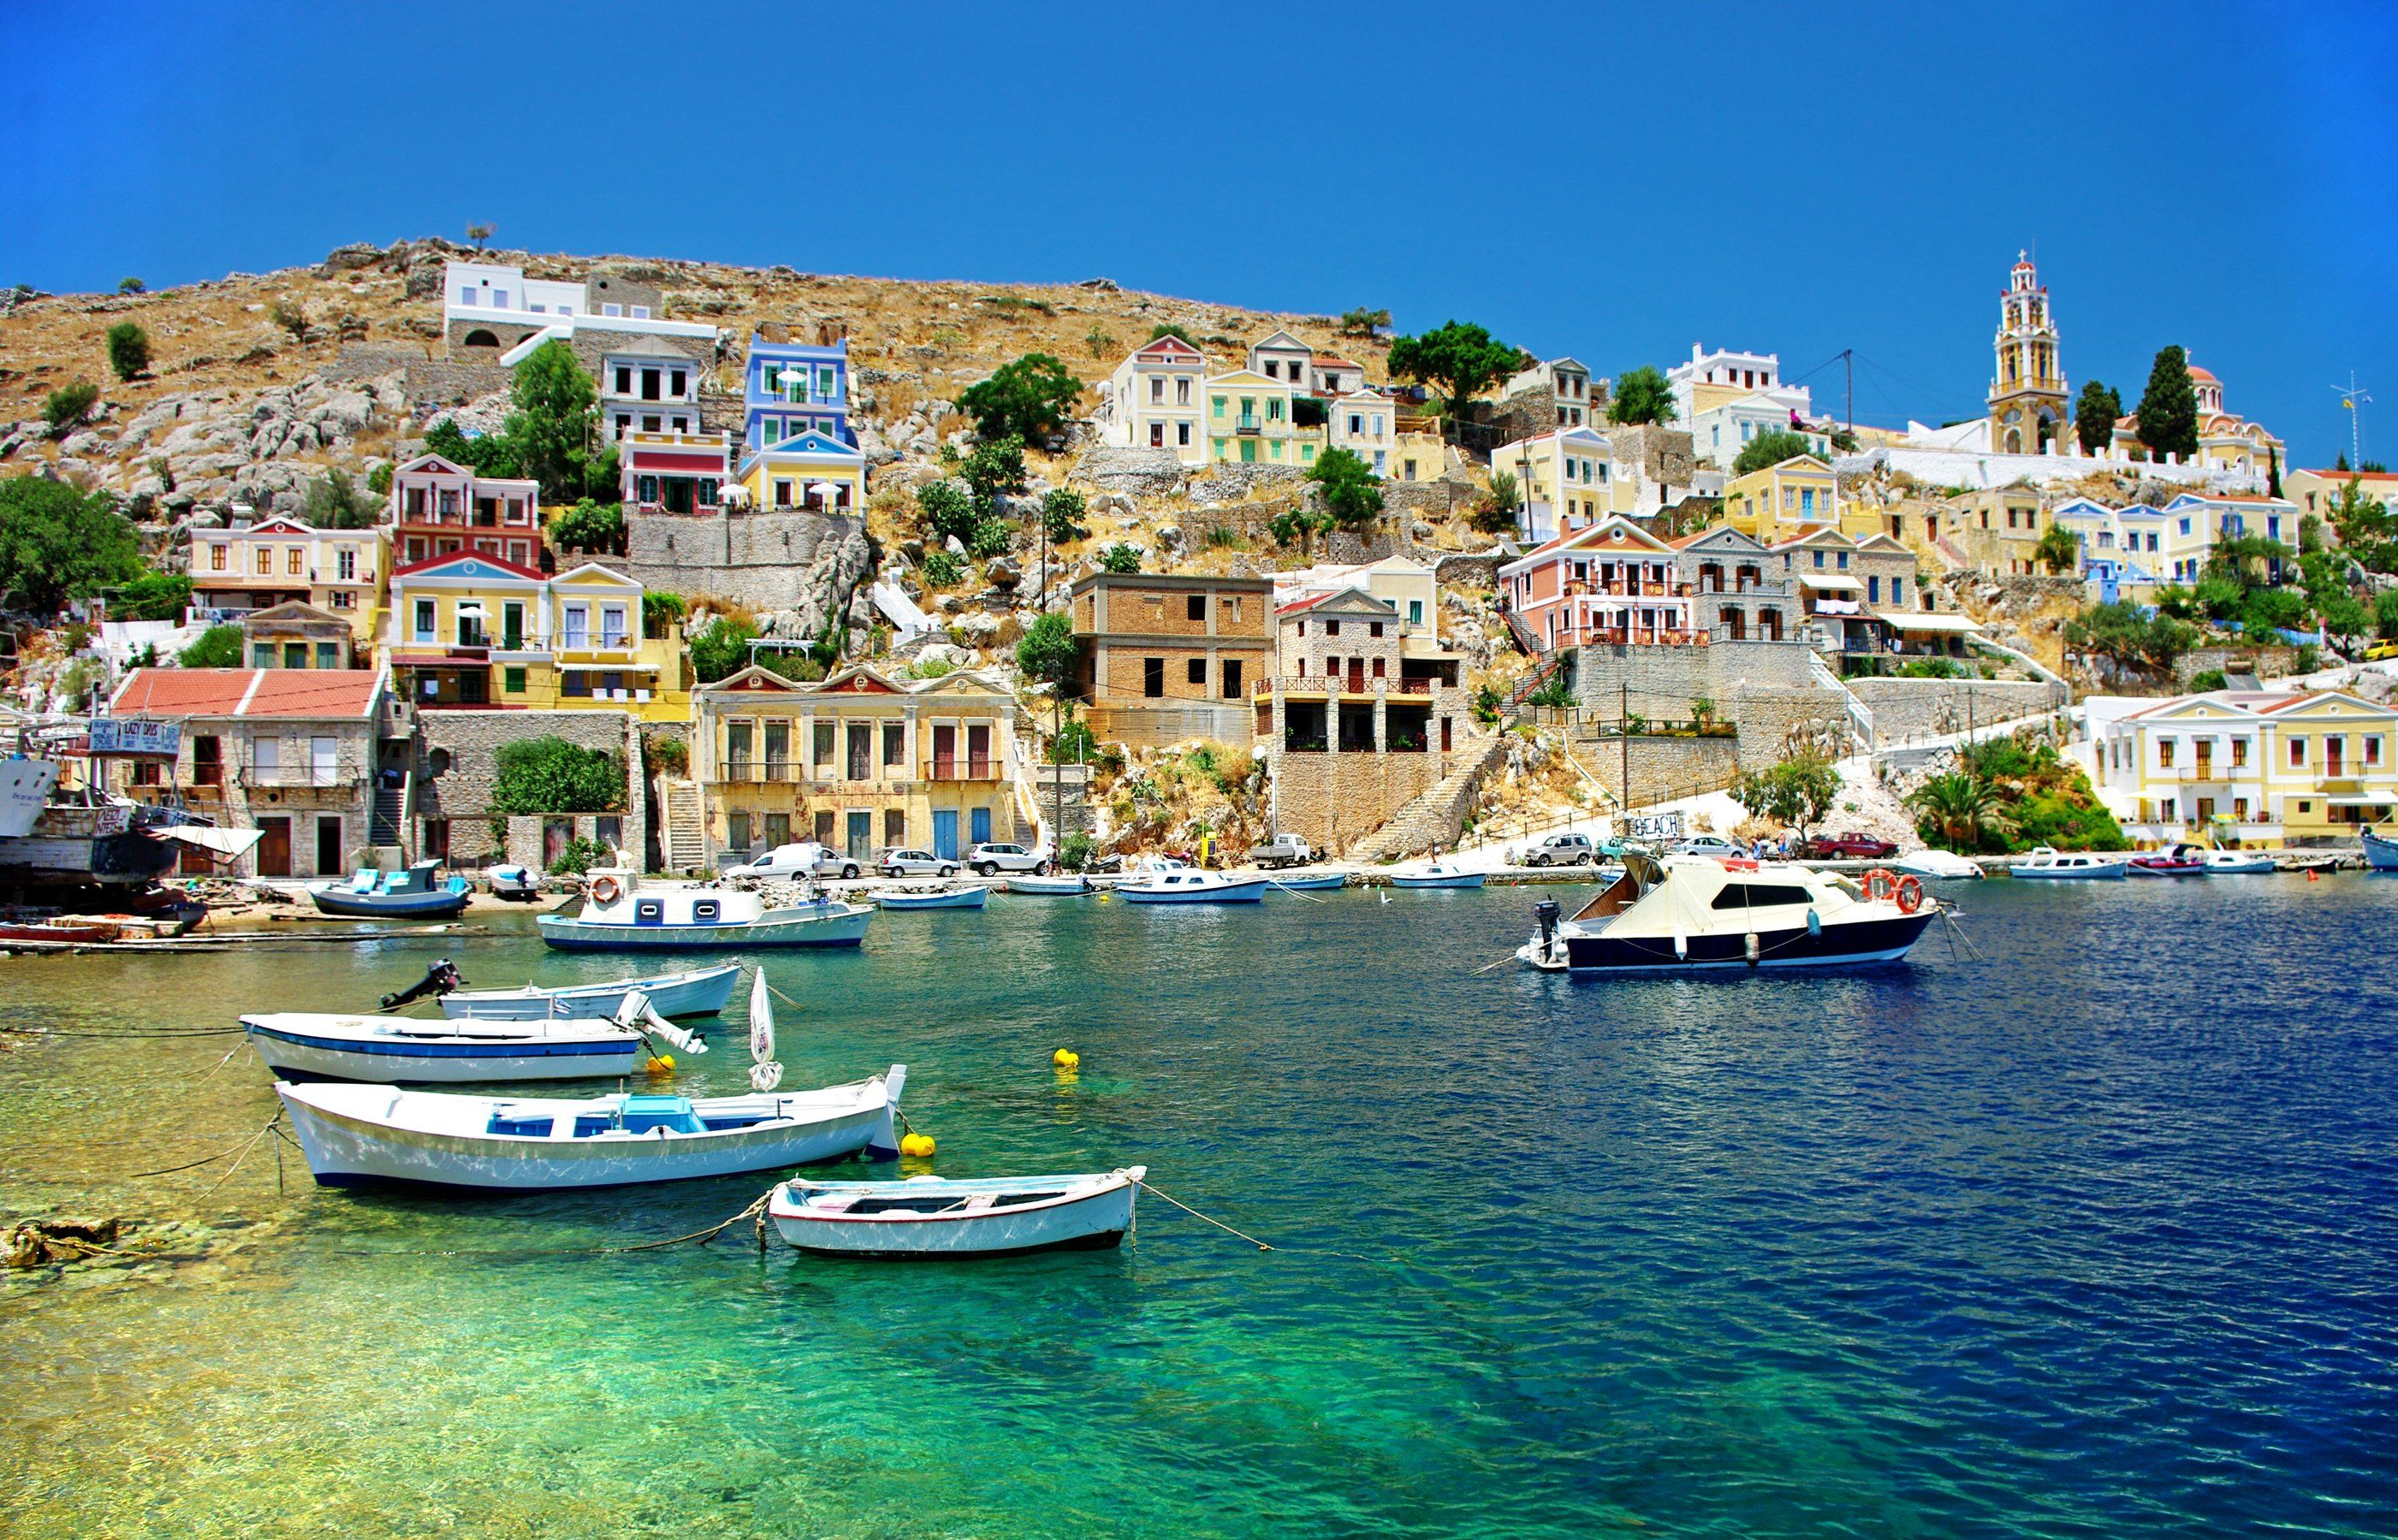 Greece Houses Sea Boats Corfu Cities wallpaper 2802x1800 2802x1800